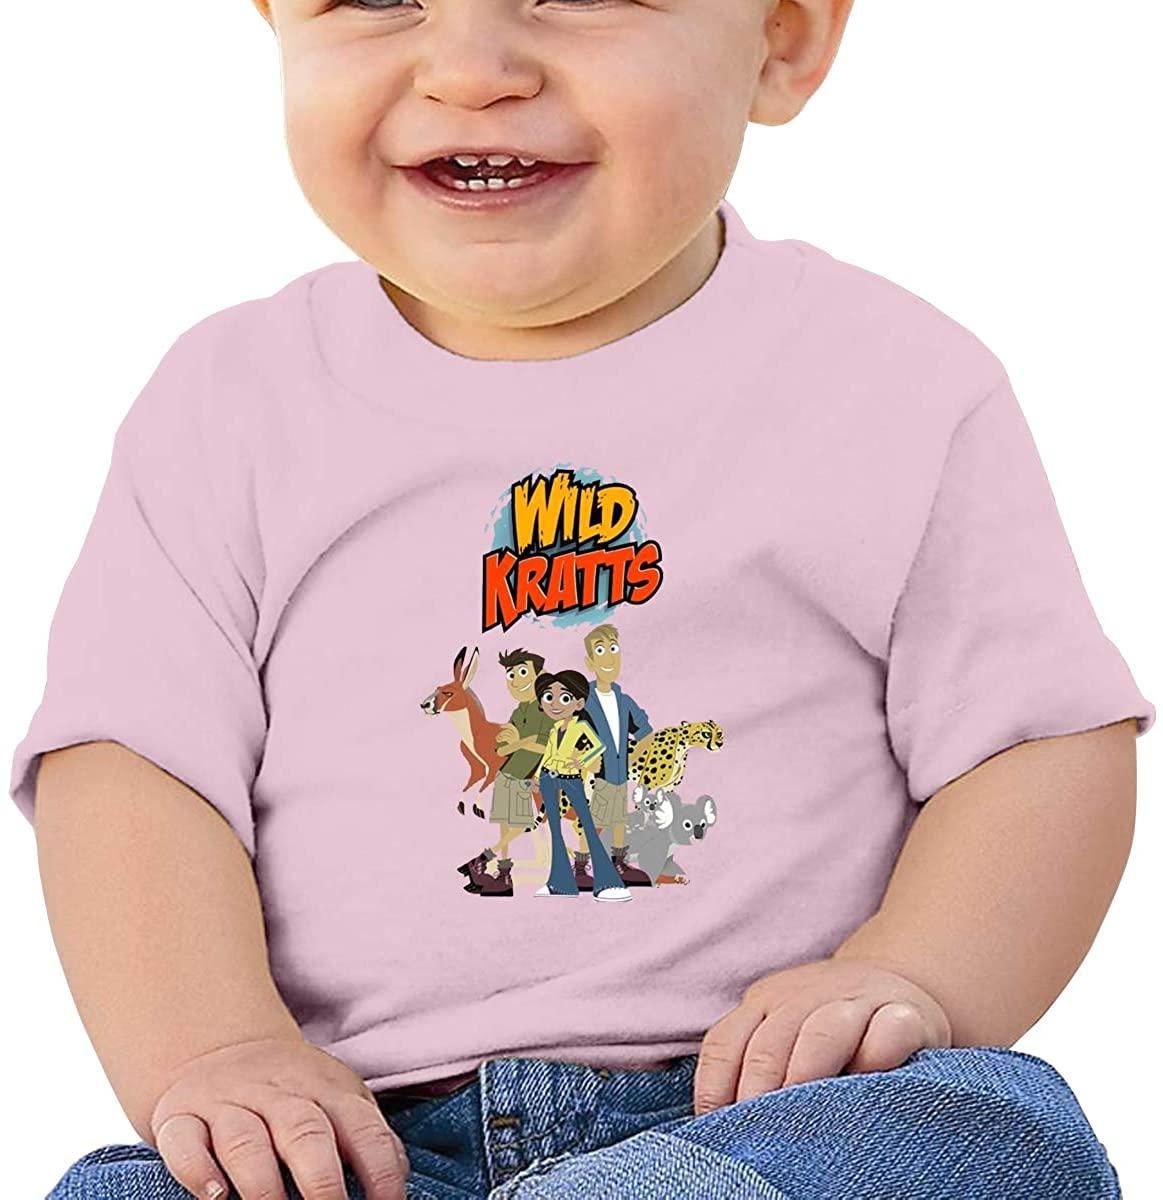 6-24 Months Boy and Girl Baby Short Sleeve T-Shirt Wild Kratts Logo Original Minimalist Style Pink